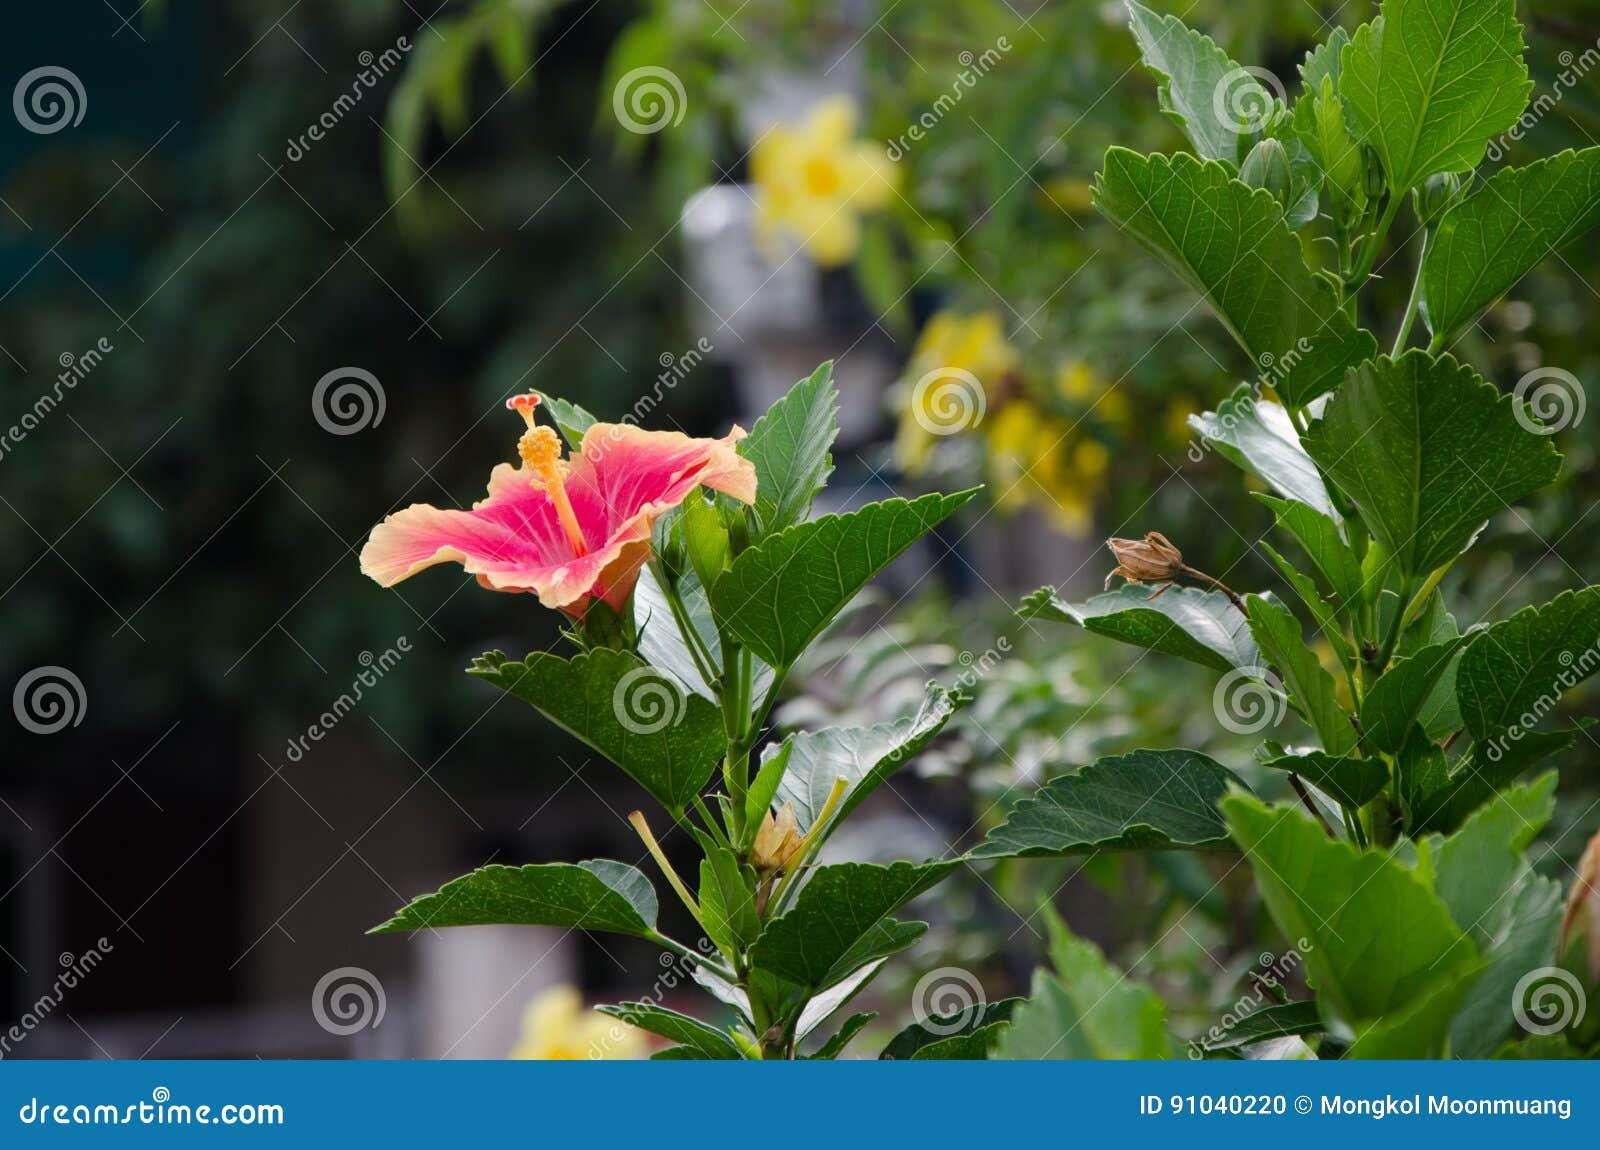 Hibiscus flower stock photo image of soaking water 91040220 hibiscus flower izmirmasajfo